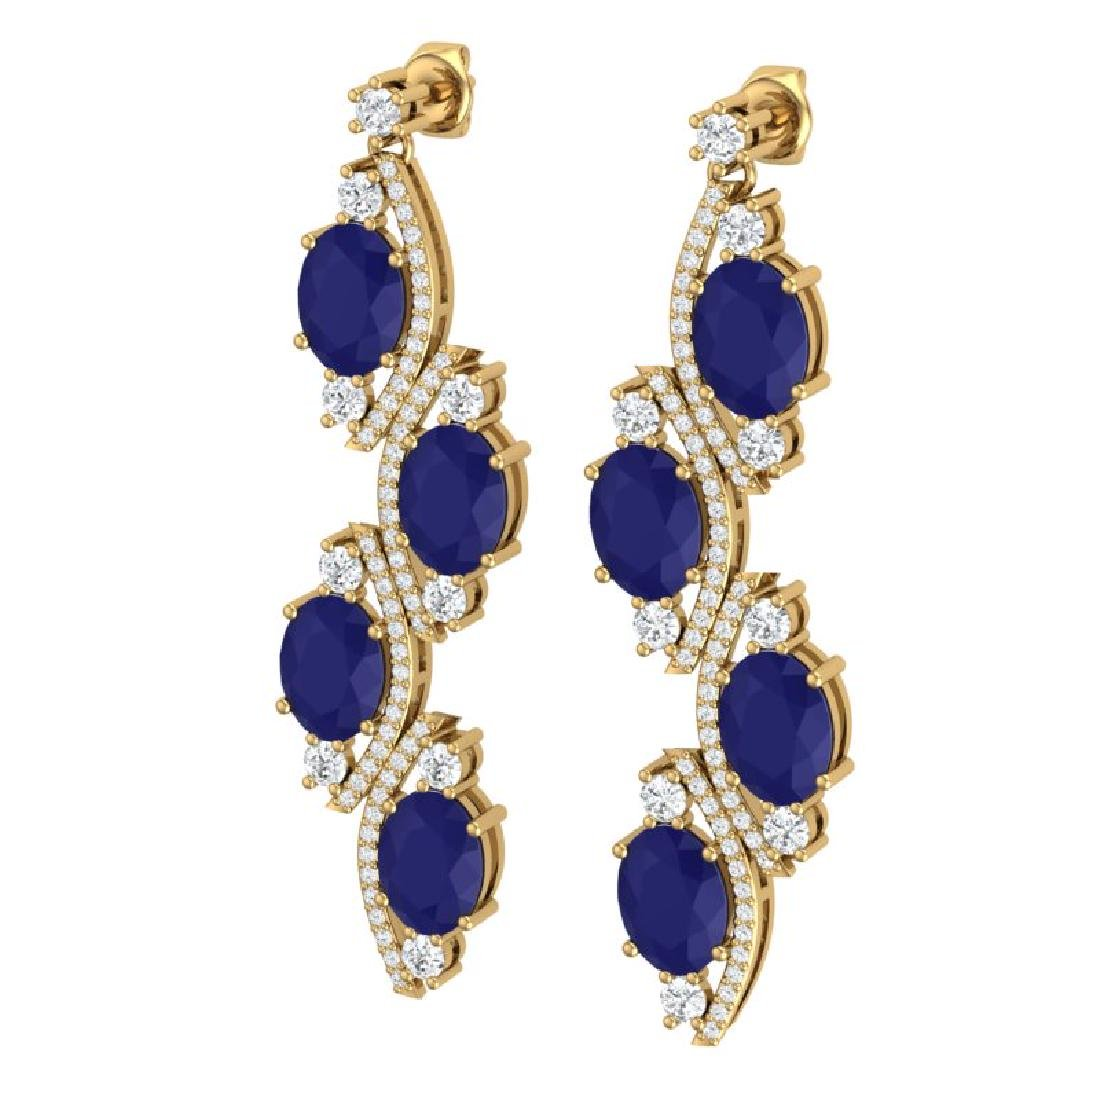 16.12 CTW Royalty Sapphire & VS Diamond Earrings 18K - 2